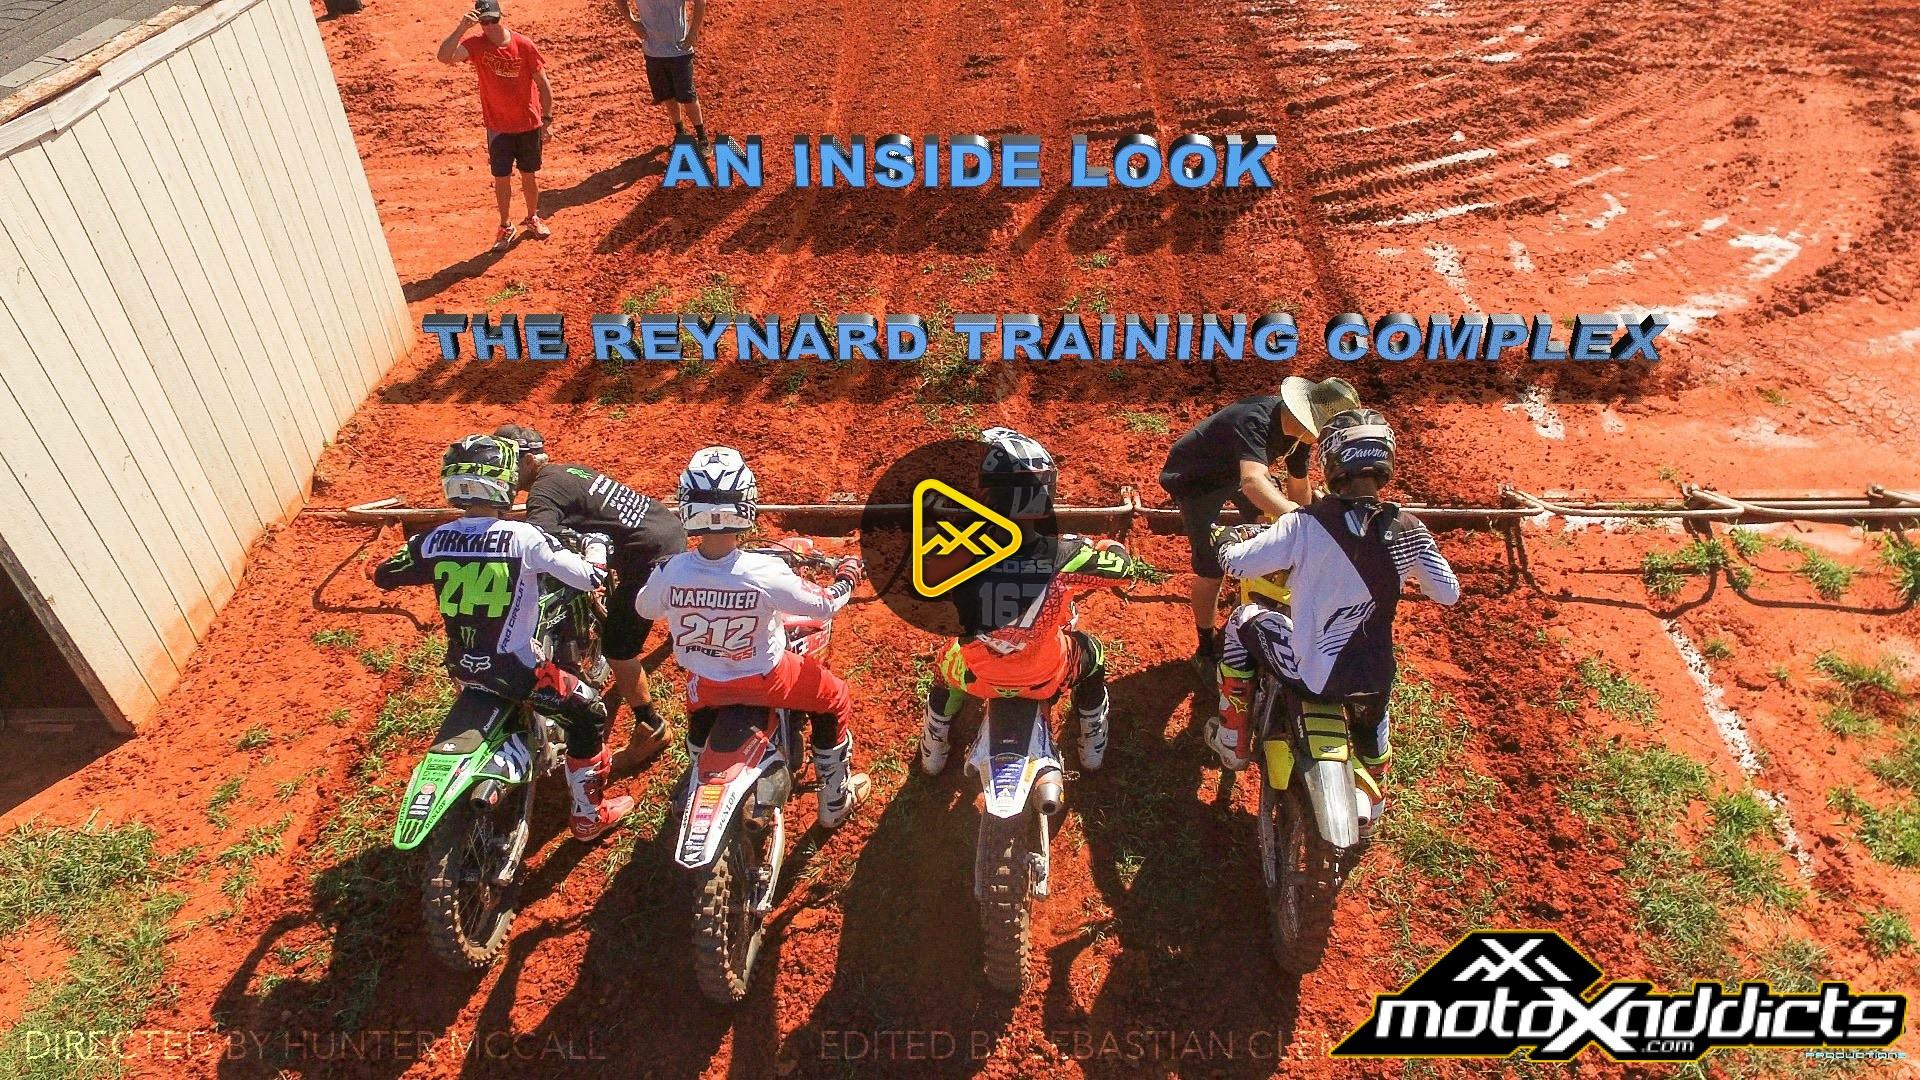 An Inside Look – Reynard Training Complex